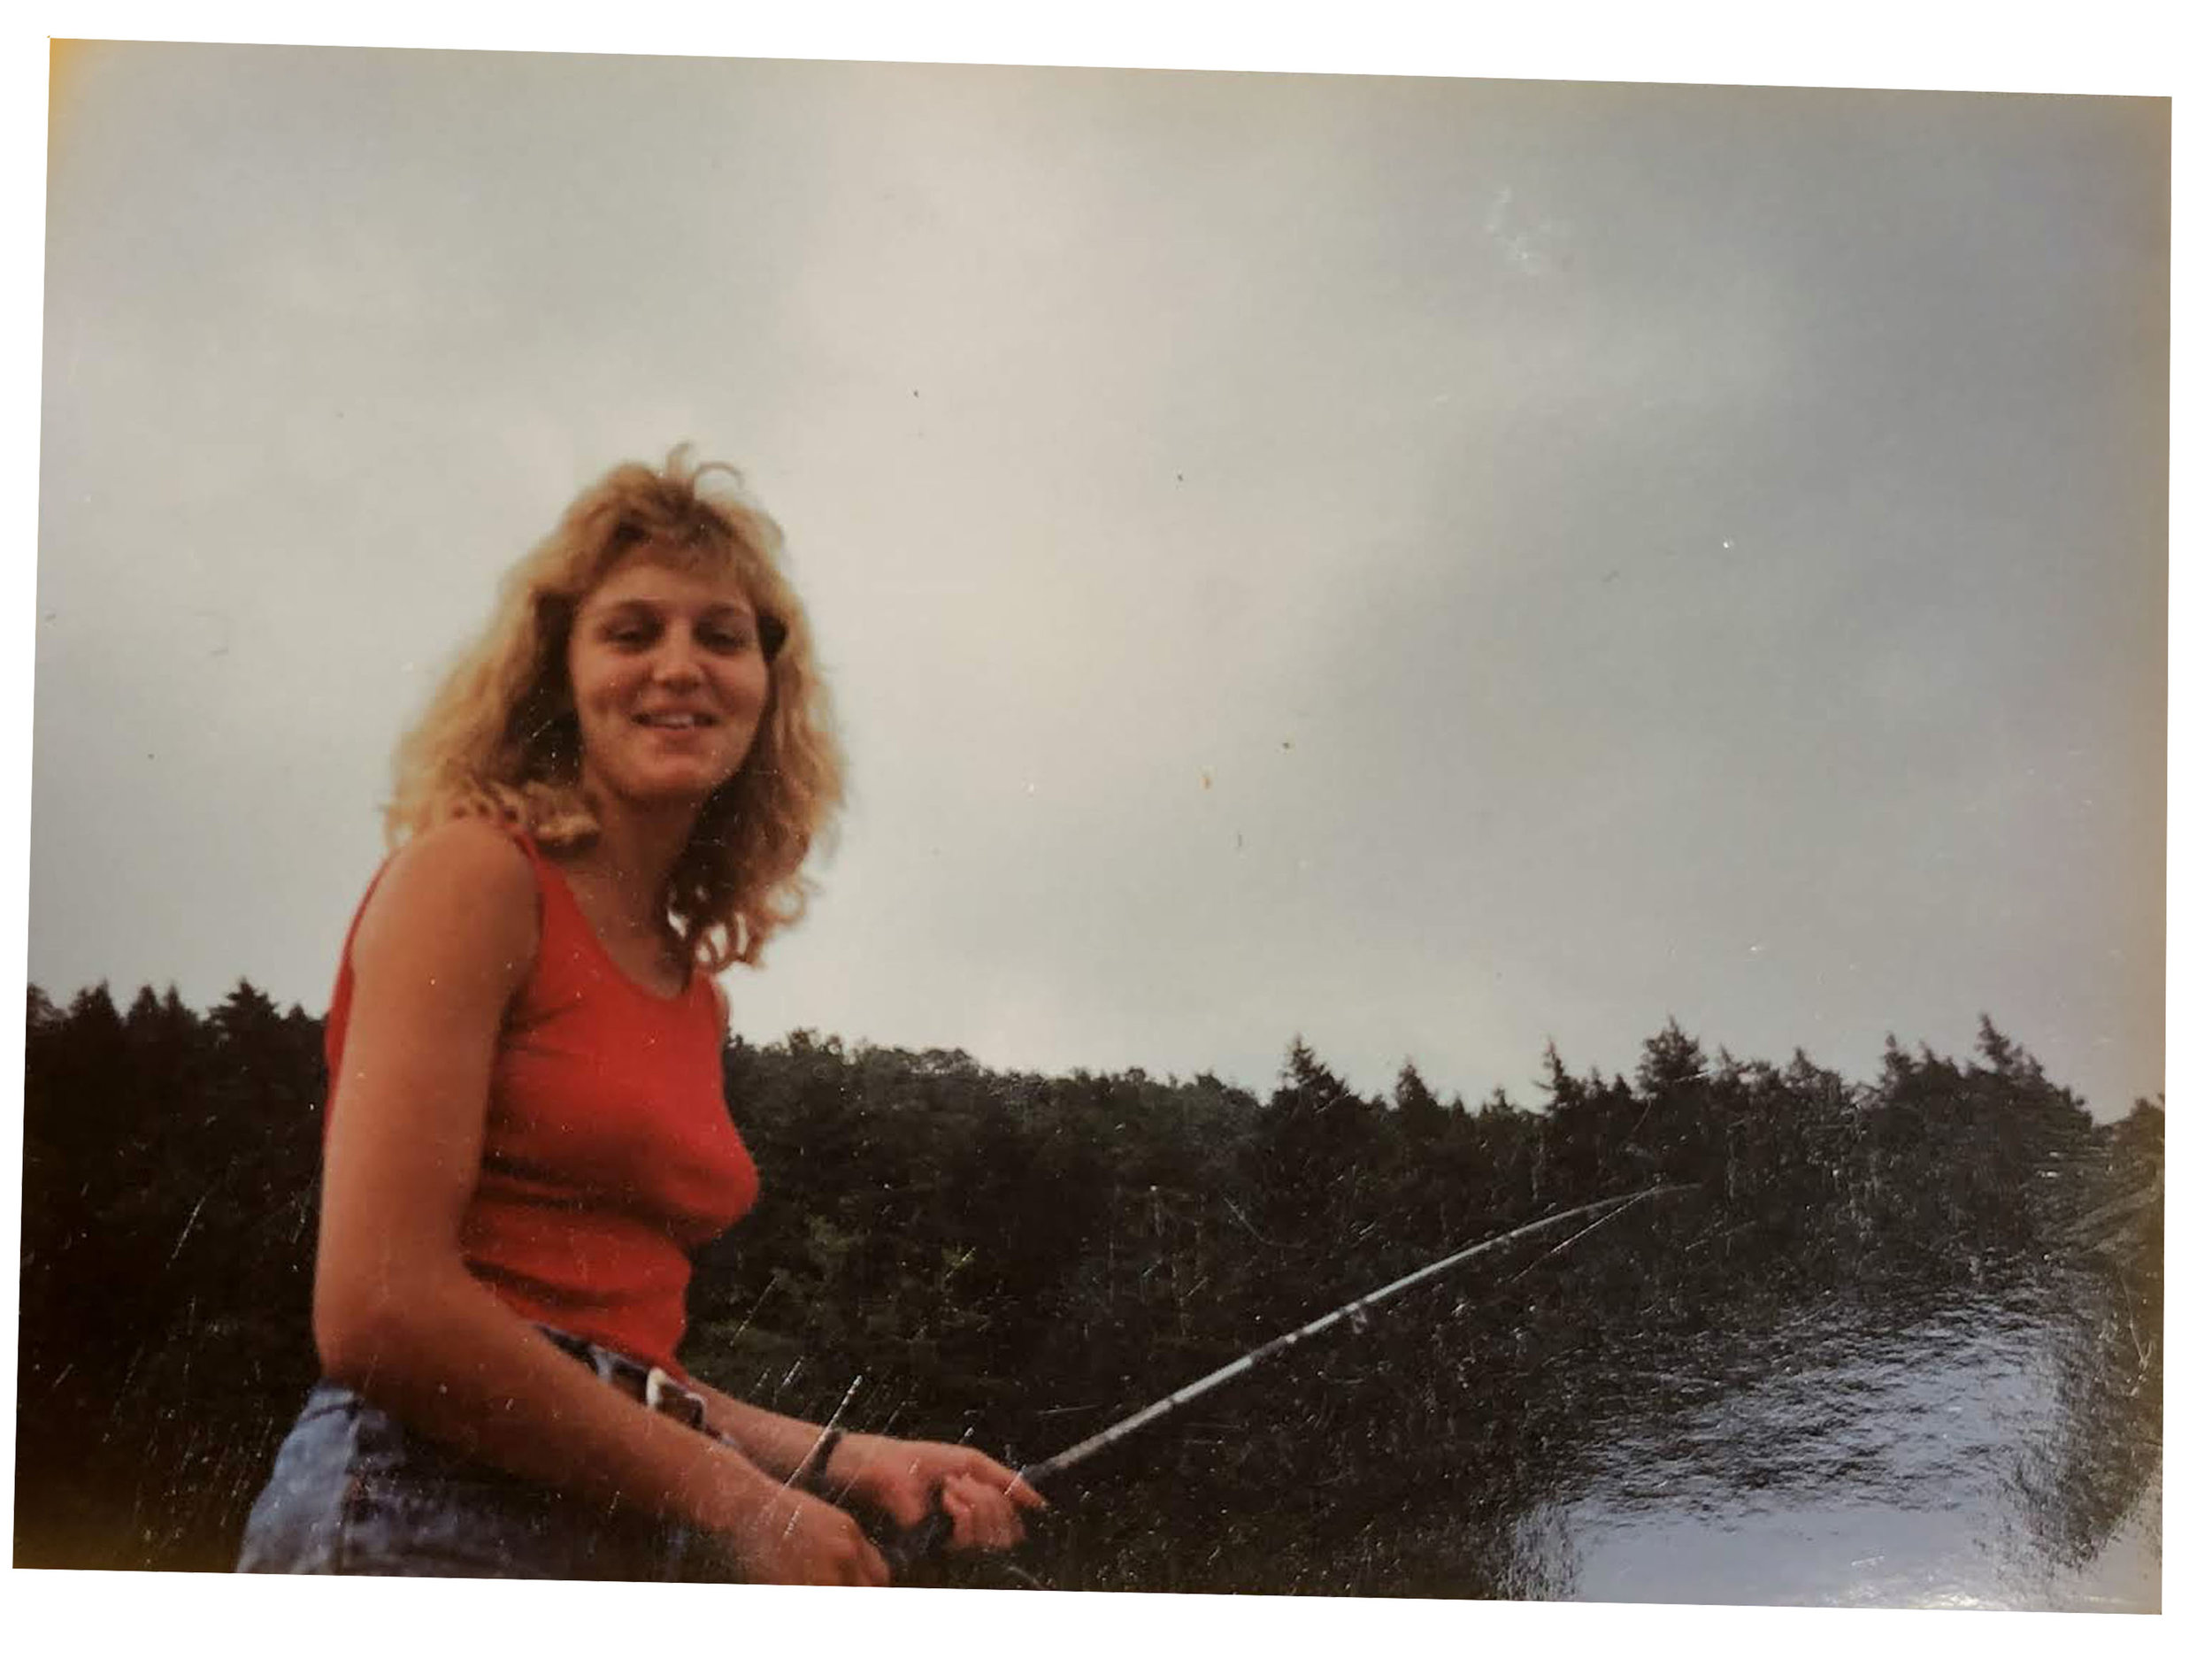 Betty_Fishing_Pole copy.jpg